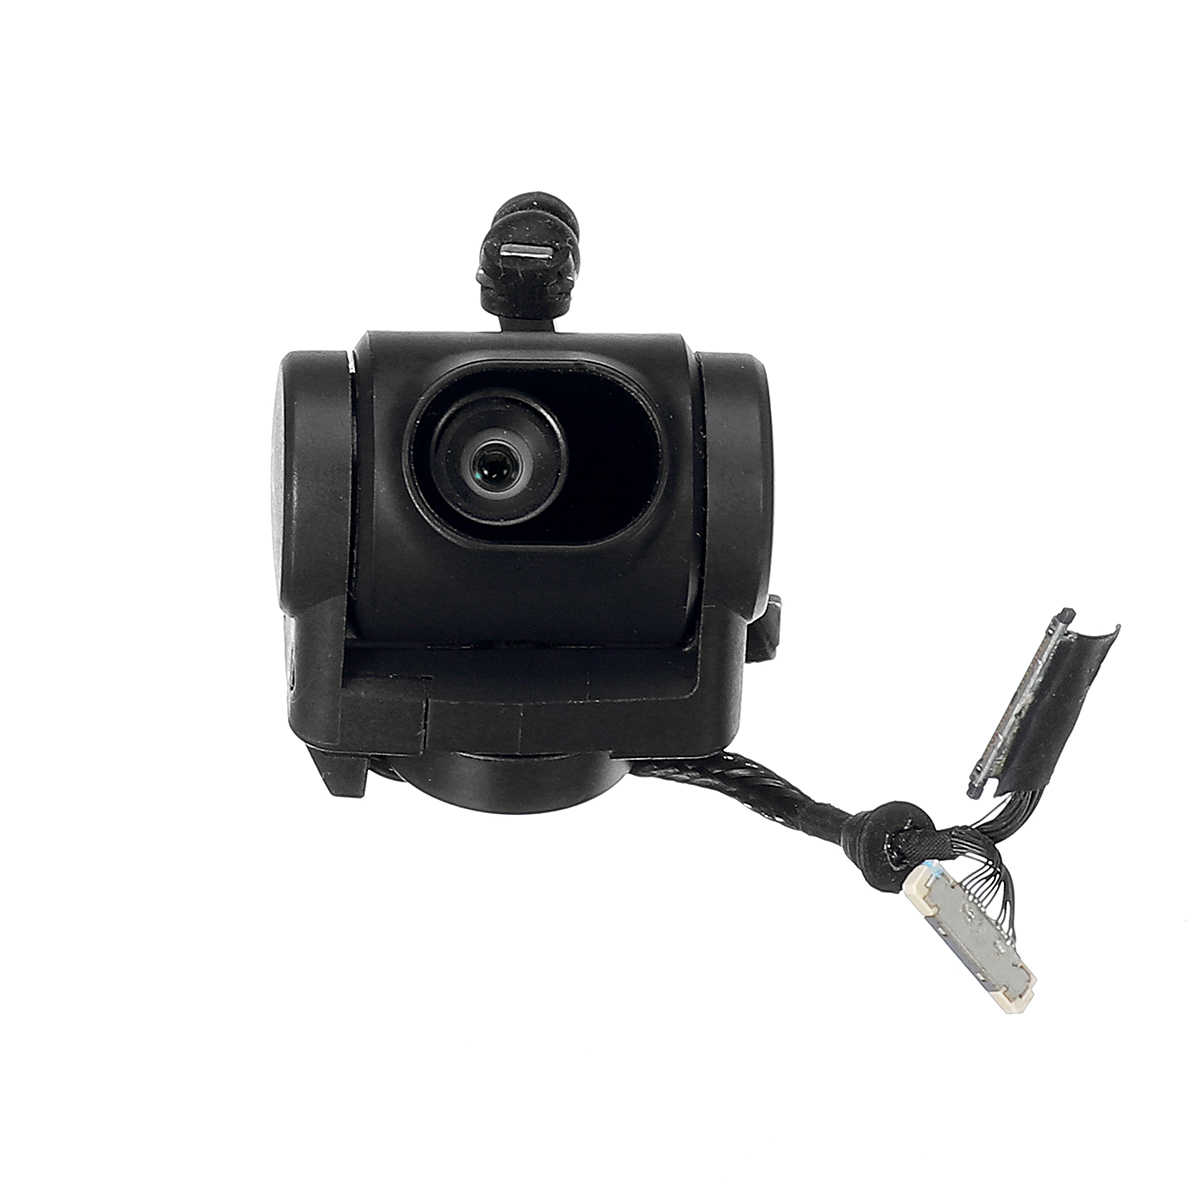 Cardán Cámara Spark RC Drone pieza de reparación FPV HD pieza de reparación para DJI Spark Drone s con cable plano